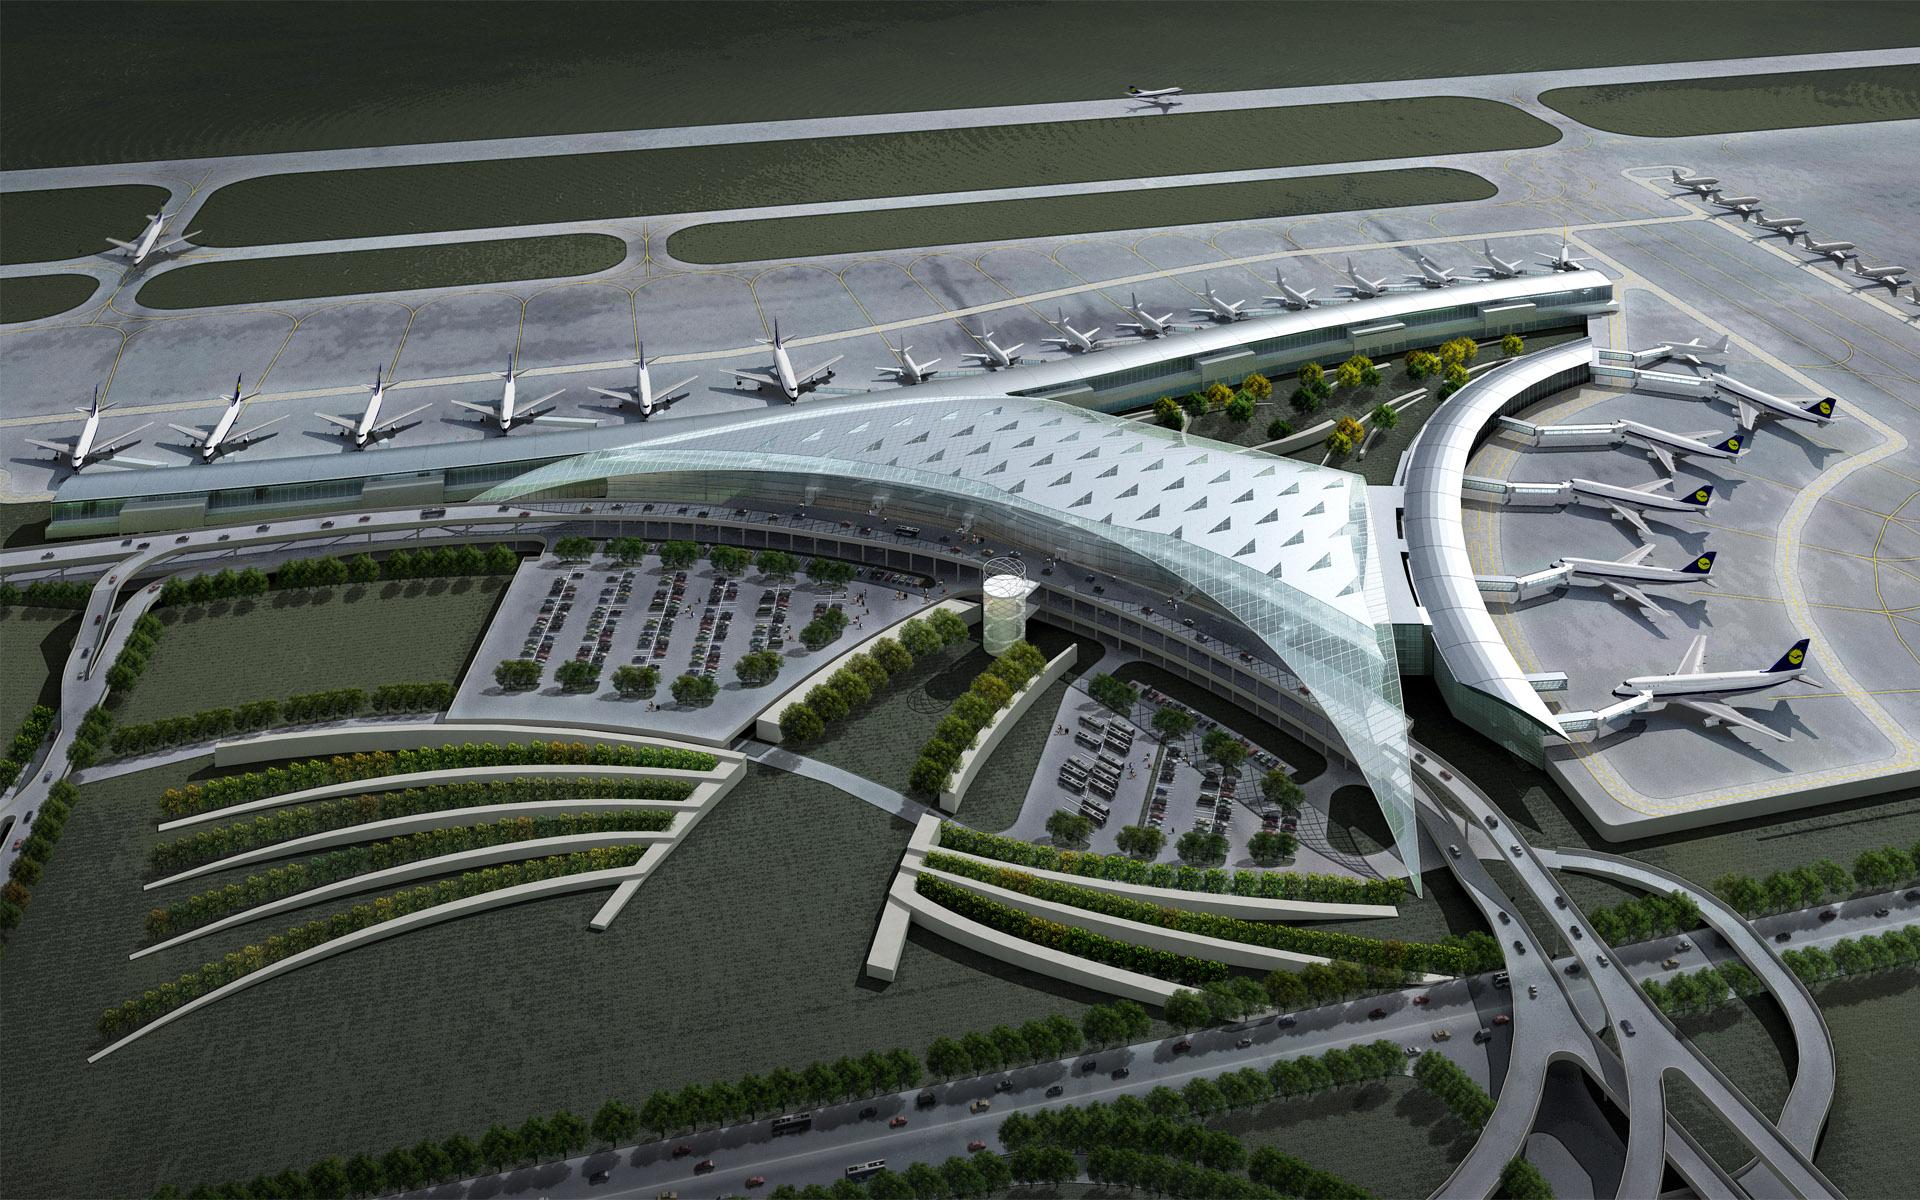 image matagorda international airport jpg allied states wiki